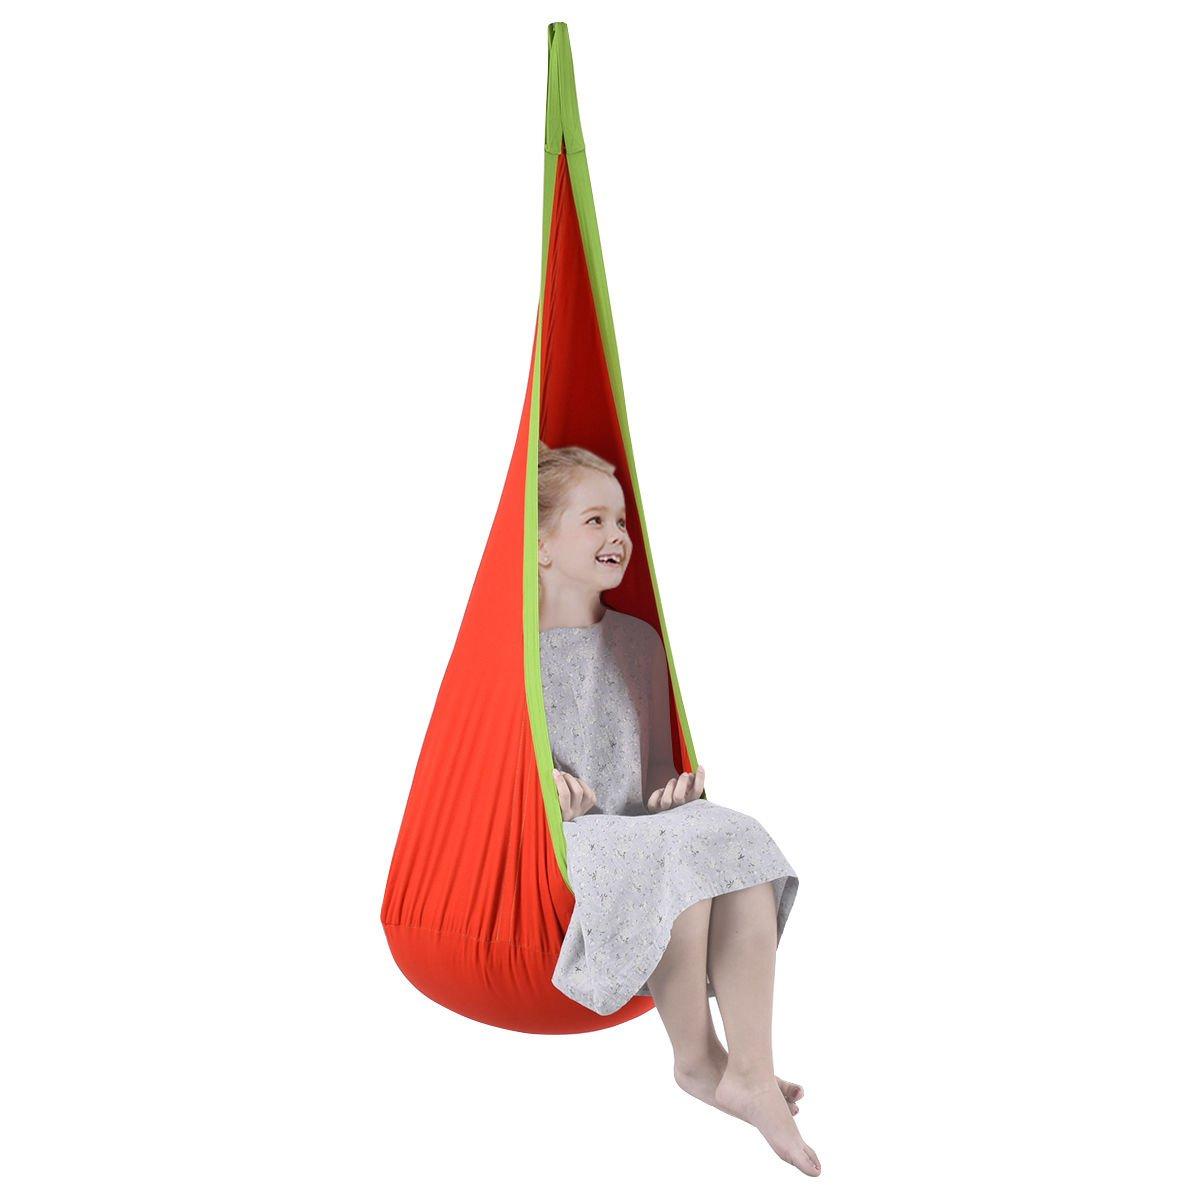 K & A会社スイングシートHangingハンモックインドアアウトドア子テント子供用椅子Nook Pod Reading旅行オレンジ B076BQCVG4